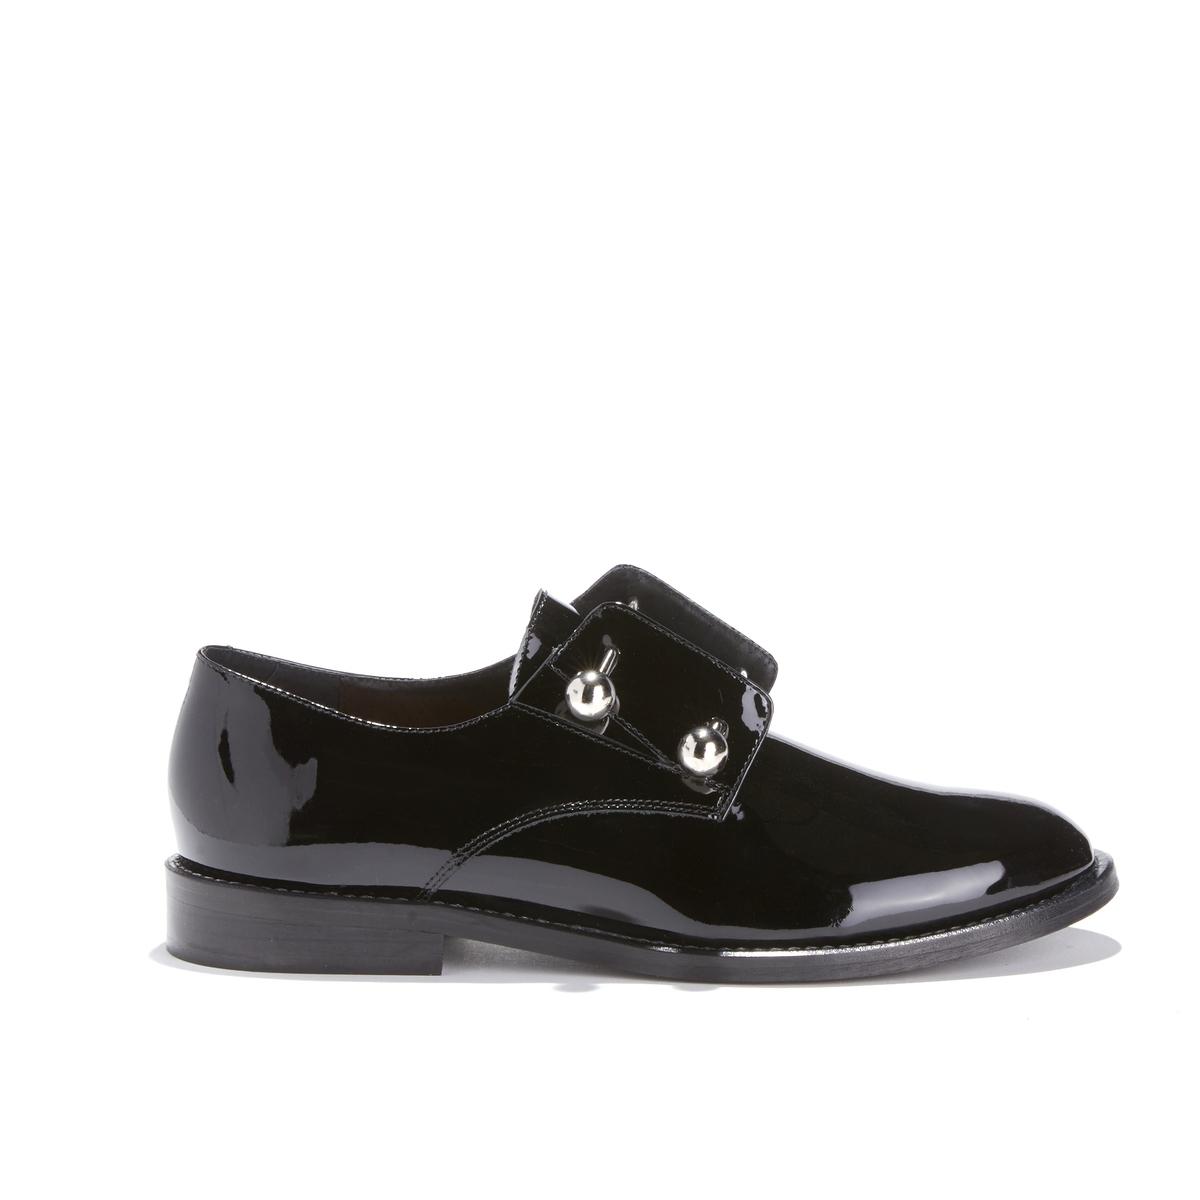 Ботинки-дерби на плоском каблуке DHUBAN ботинки дерби malika